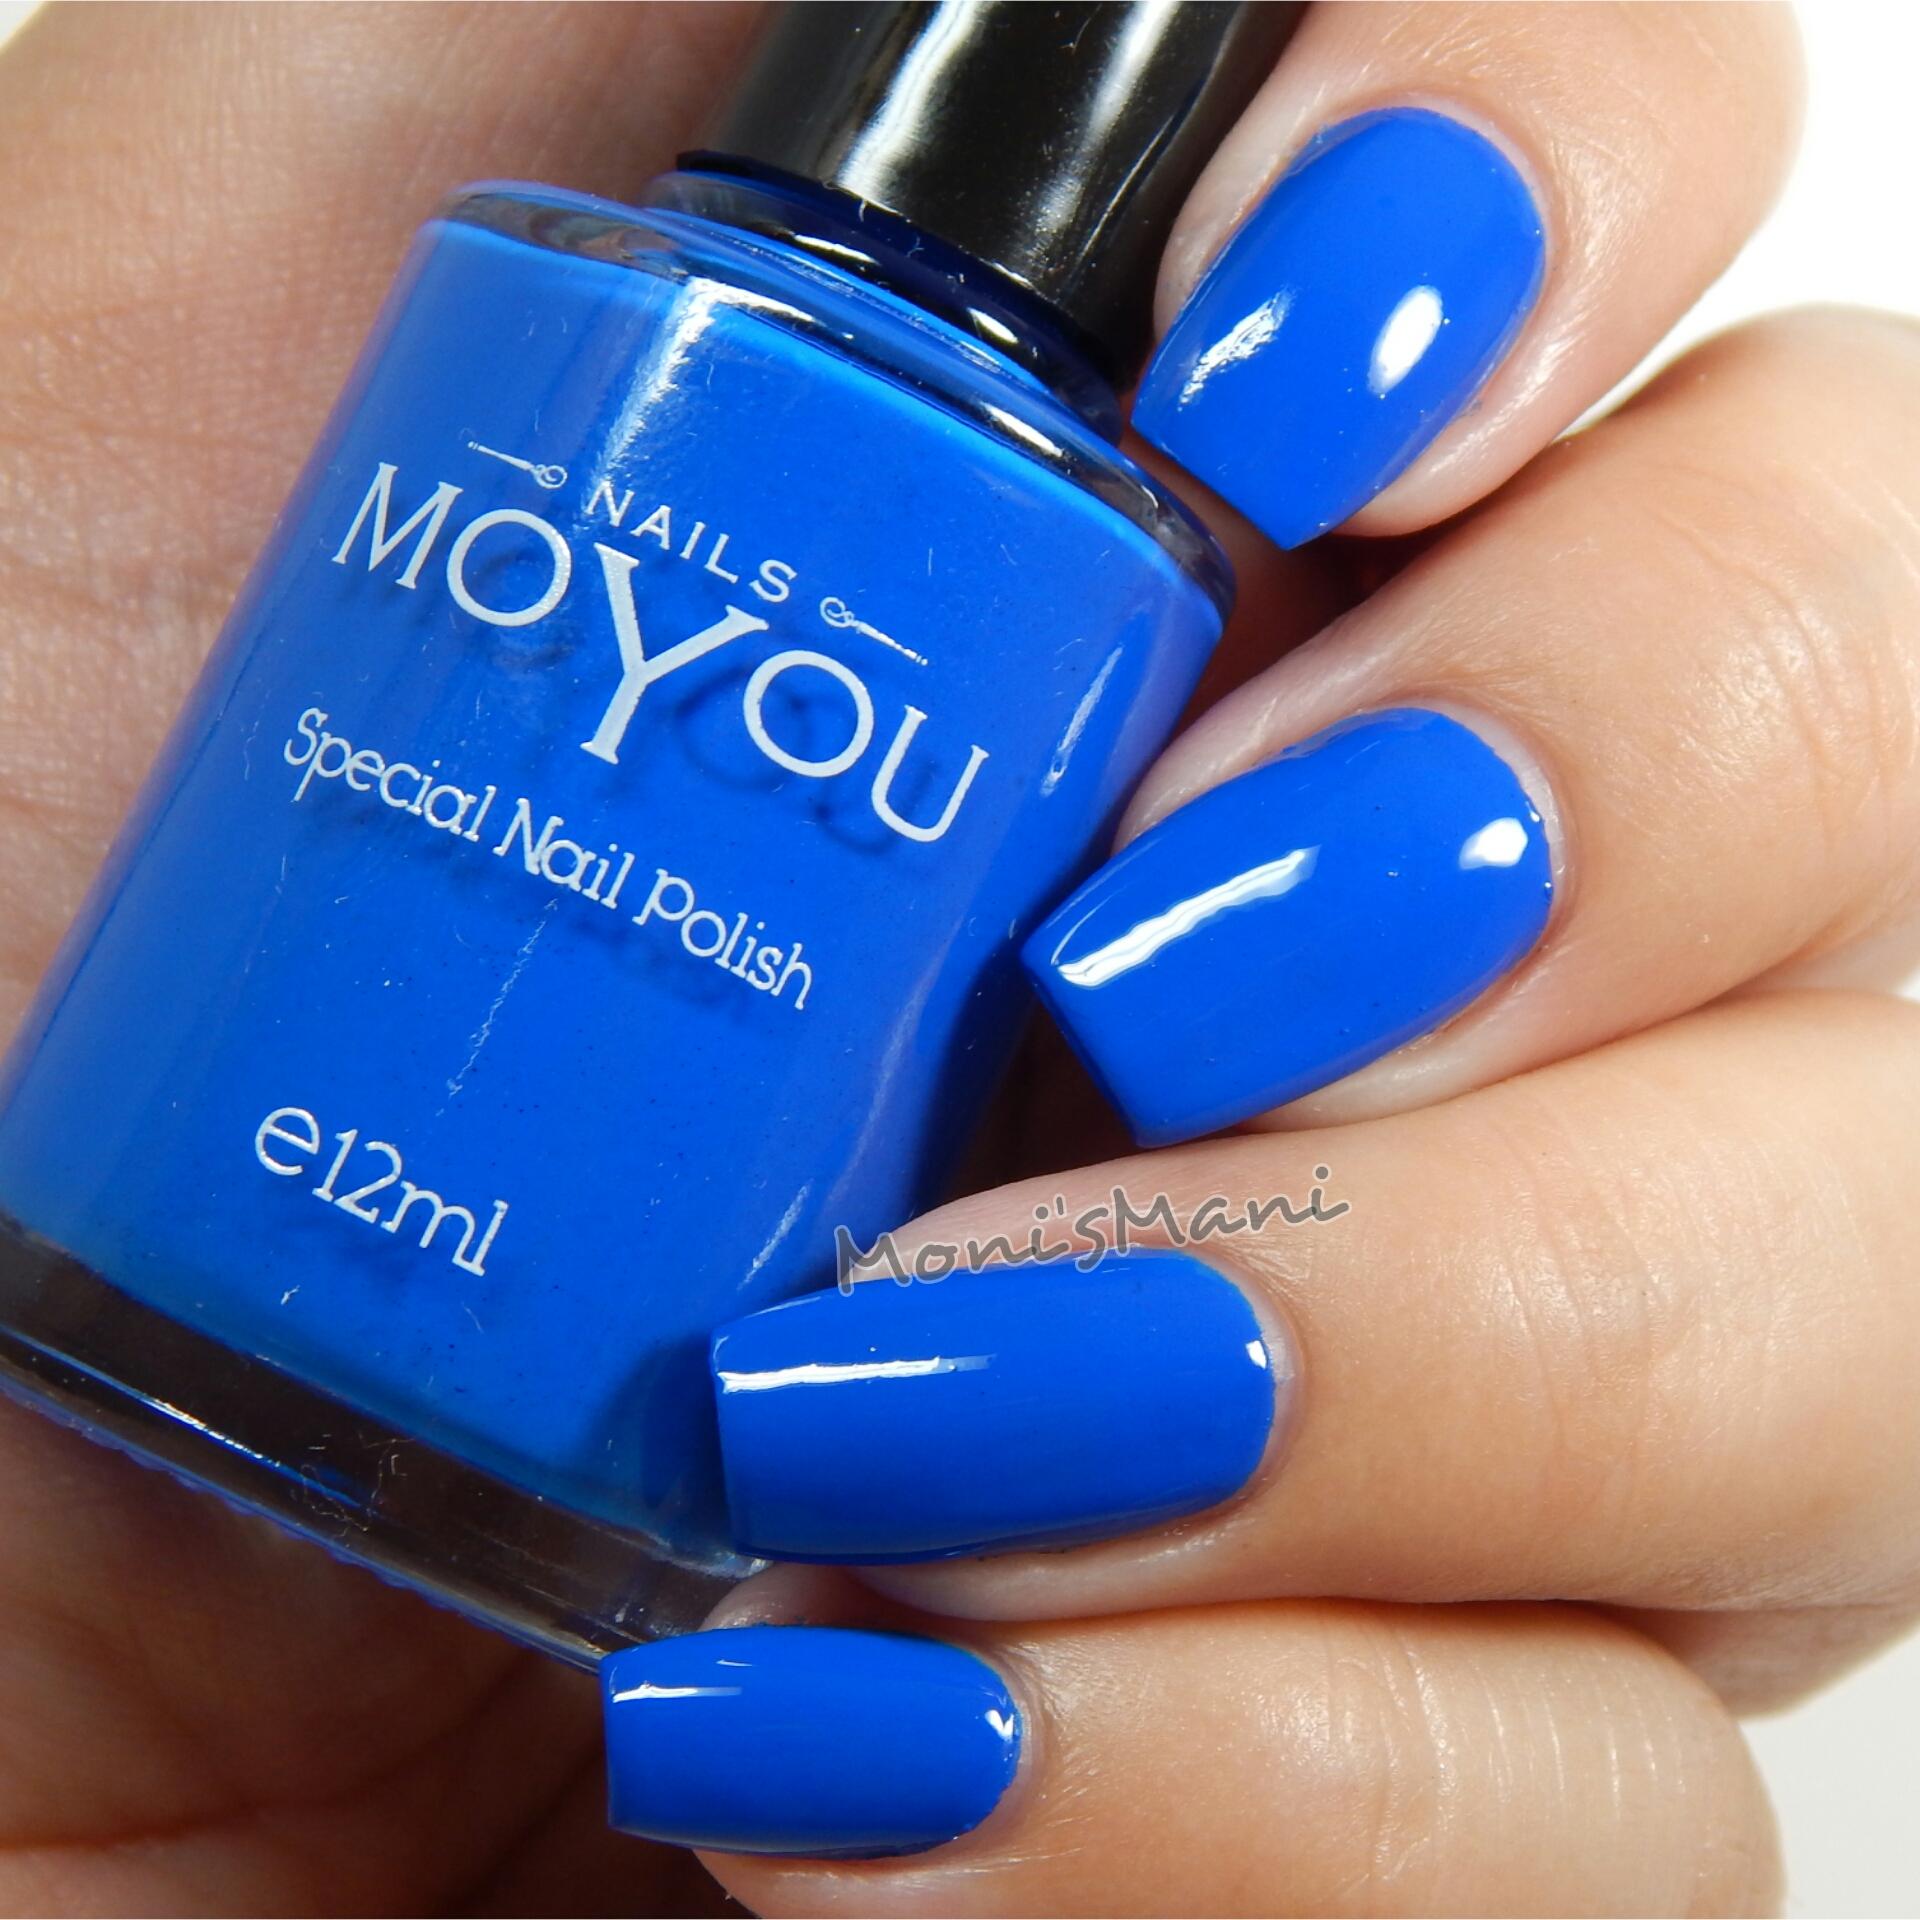 Moyou Nails Usa Blue Nail Polish Monismani